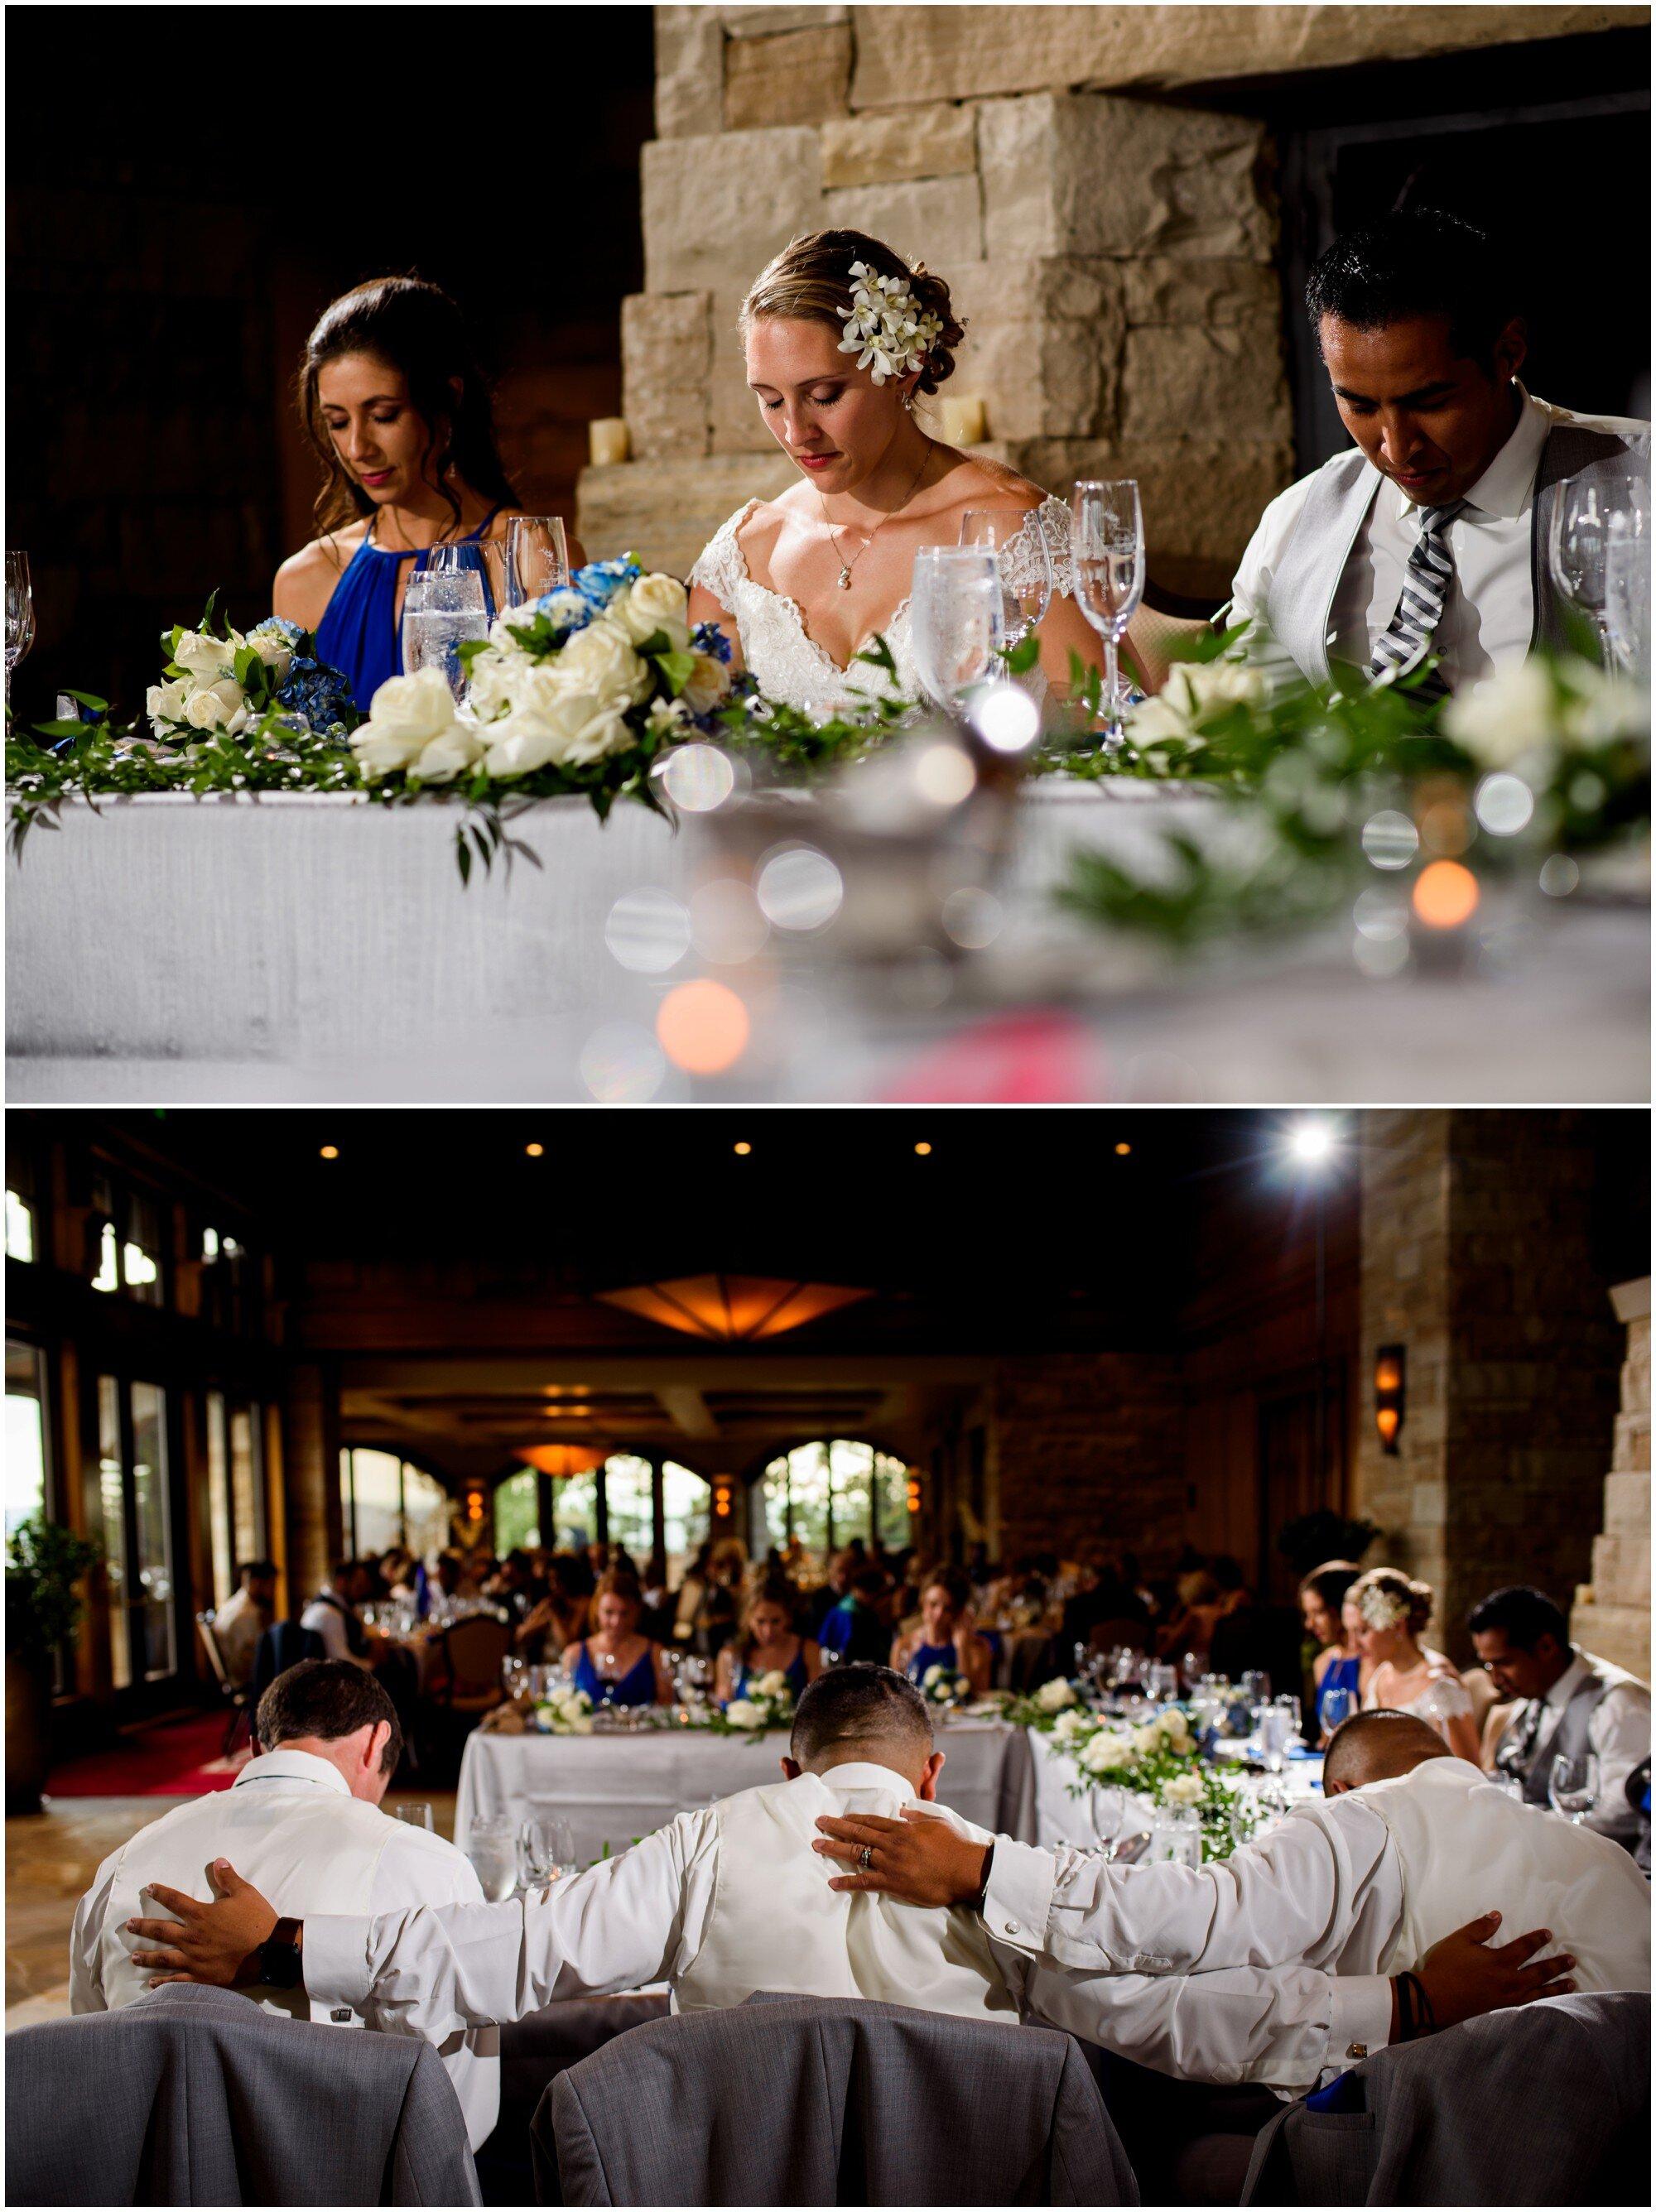 wedding party prays before sanctuary golf course wedding reception